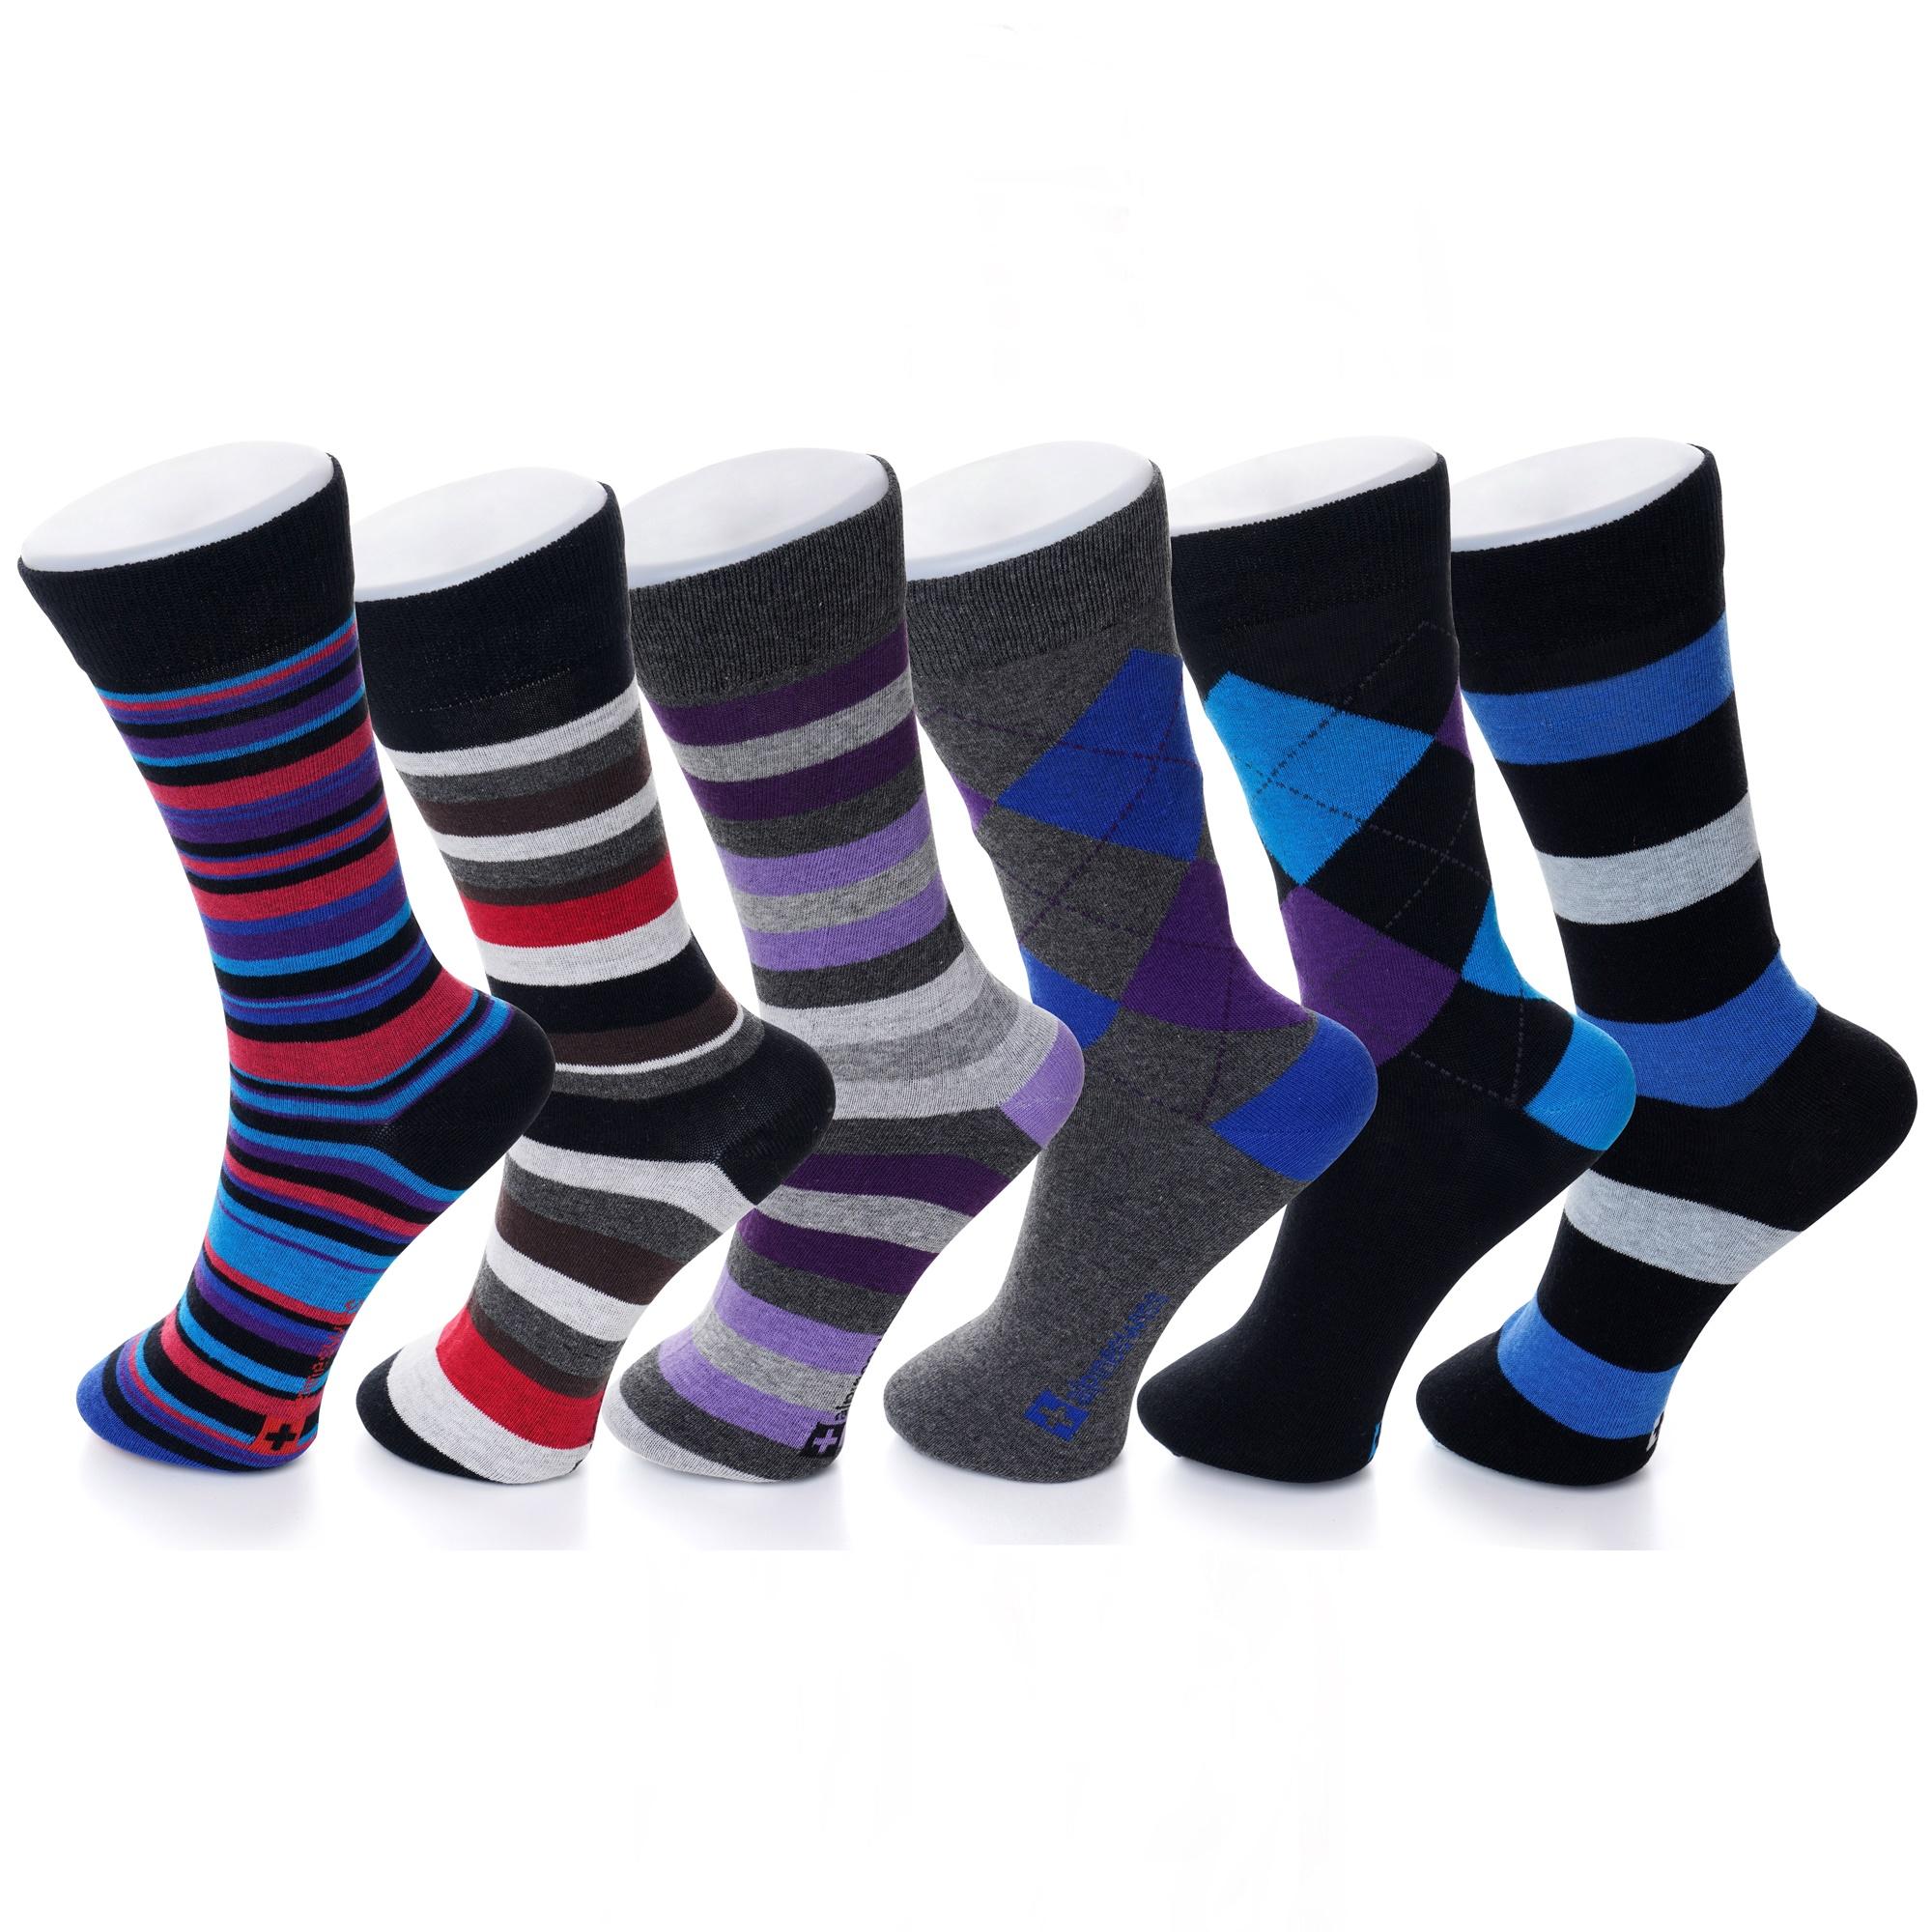 Alpine-Swiss-6-Pack-Mens-Cotton-Dress-Socks-Mid-Calf-Argyle-Pattern-Solids-Set